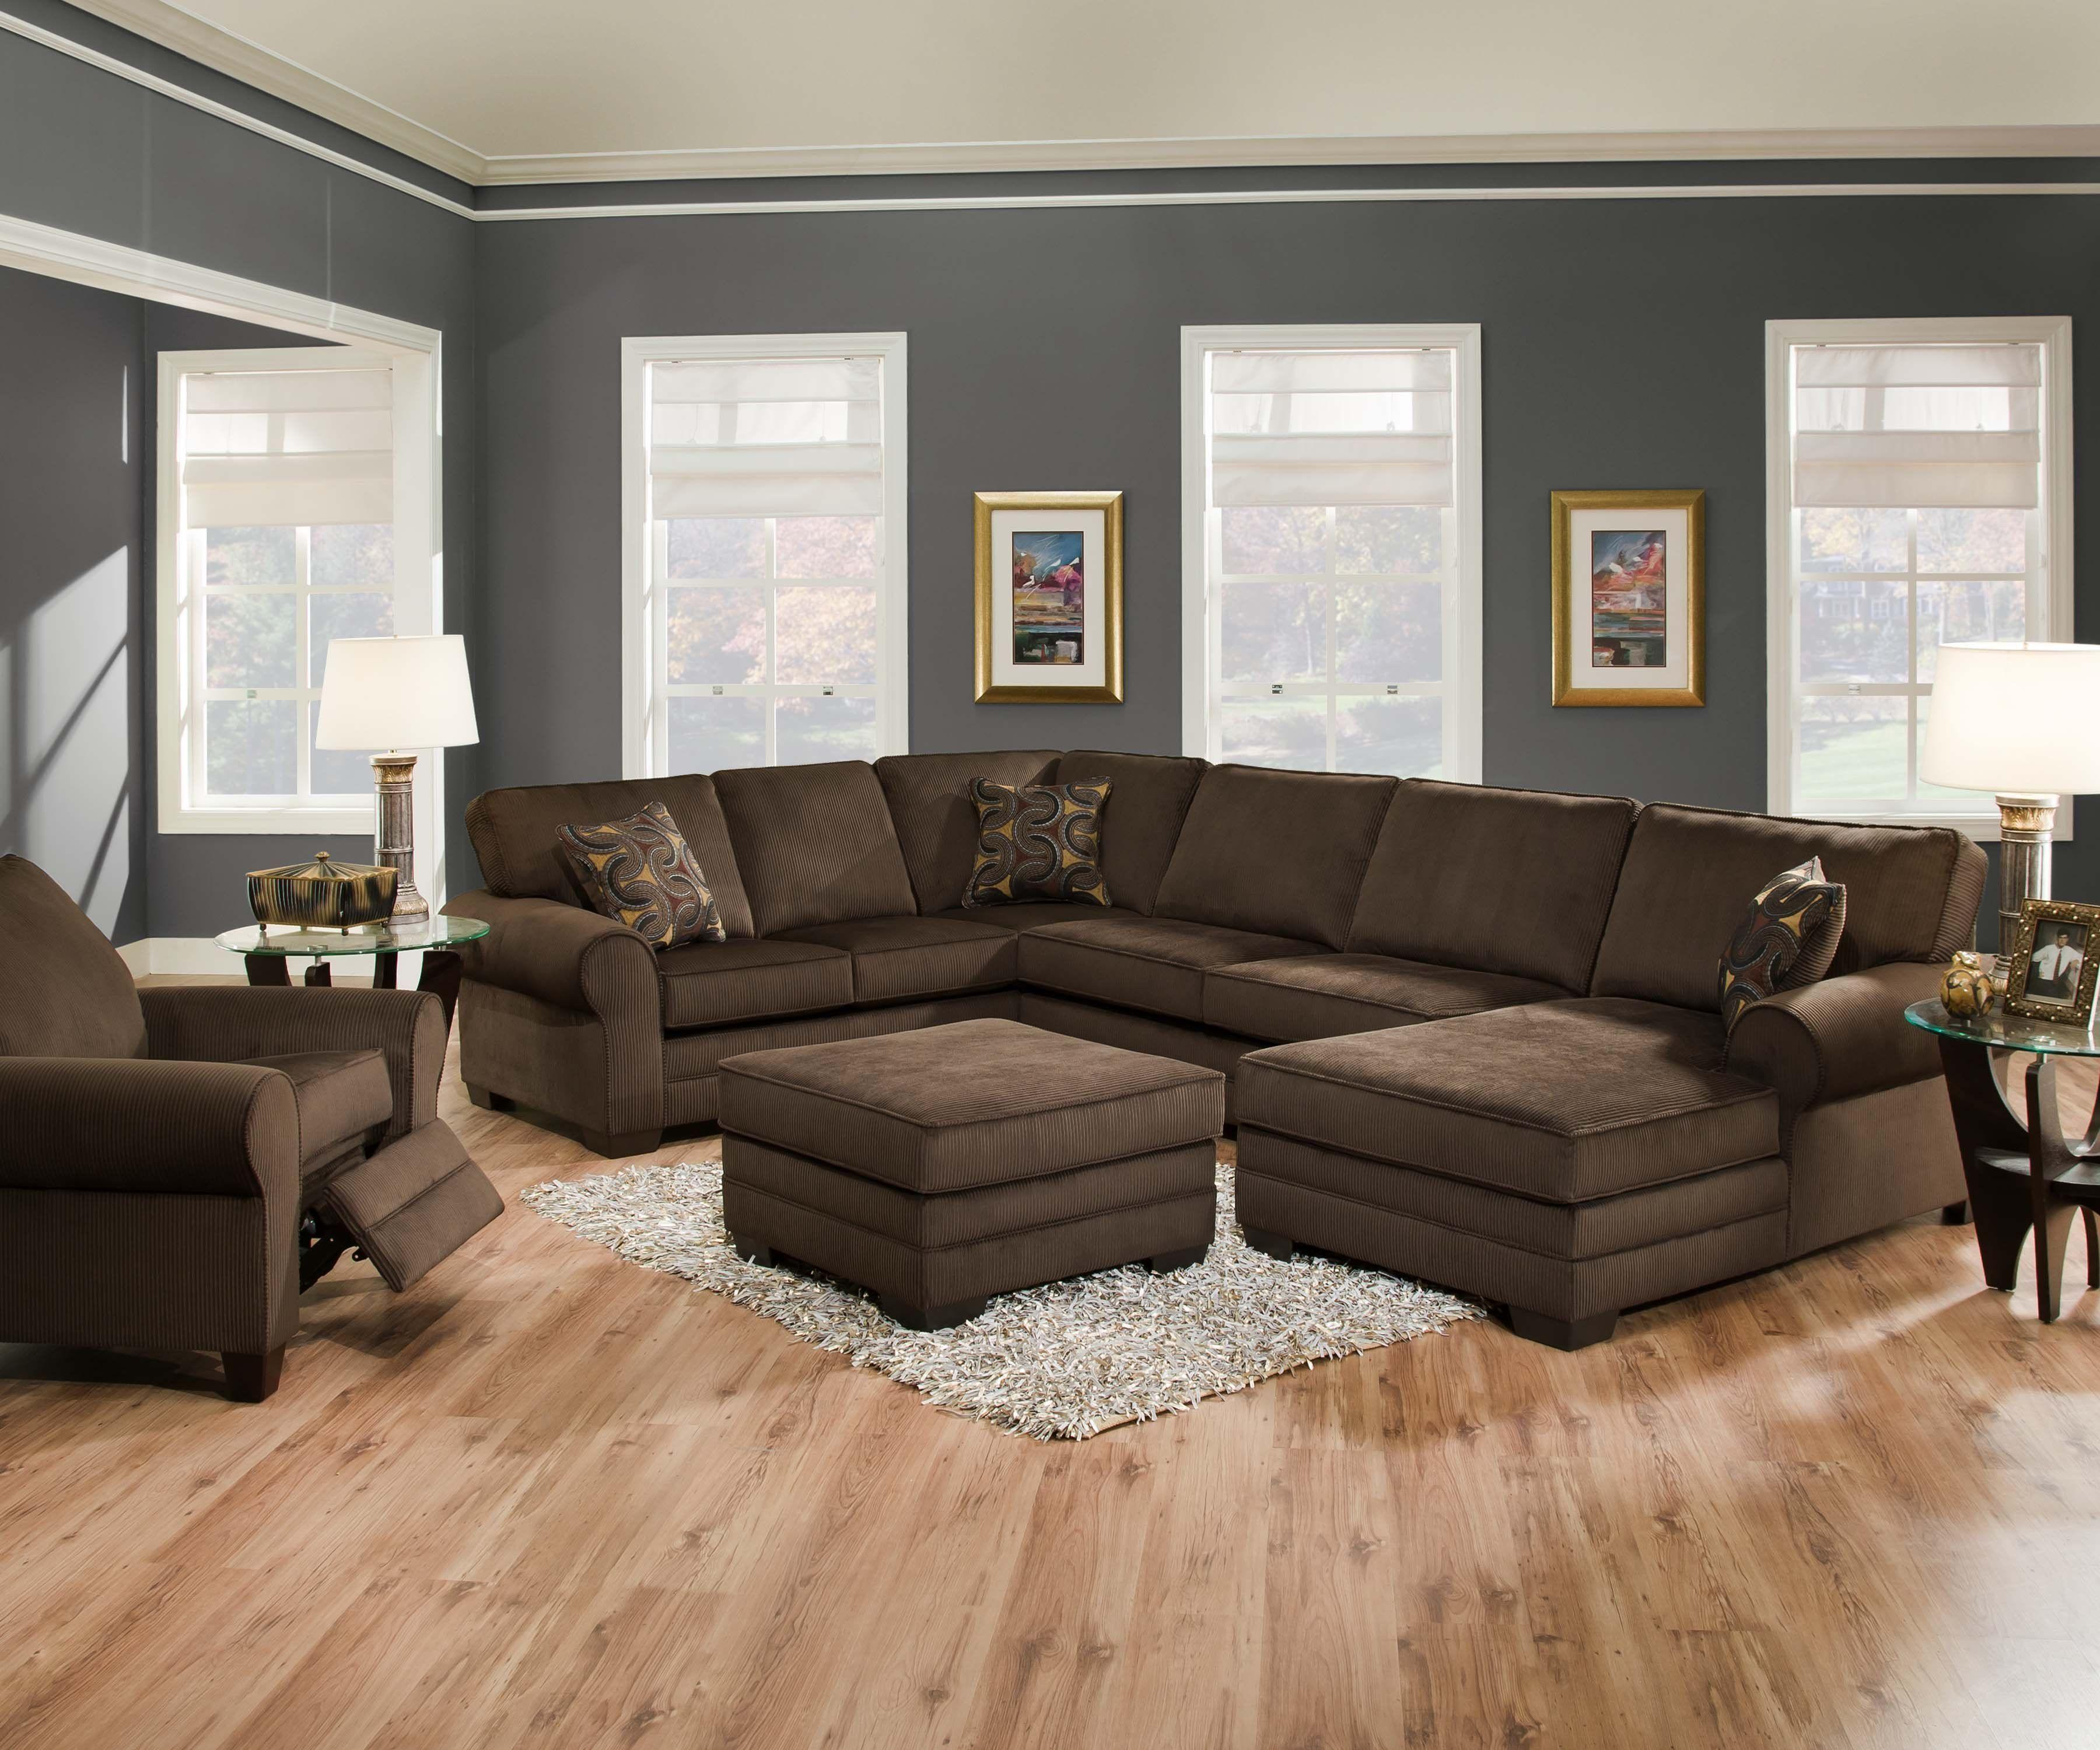 Furniture Modern Minimalist Living Room Design With Dark